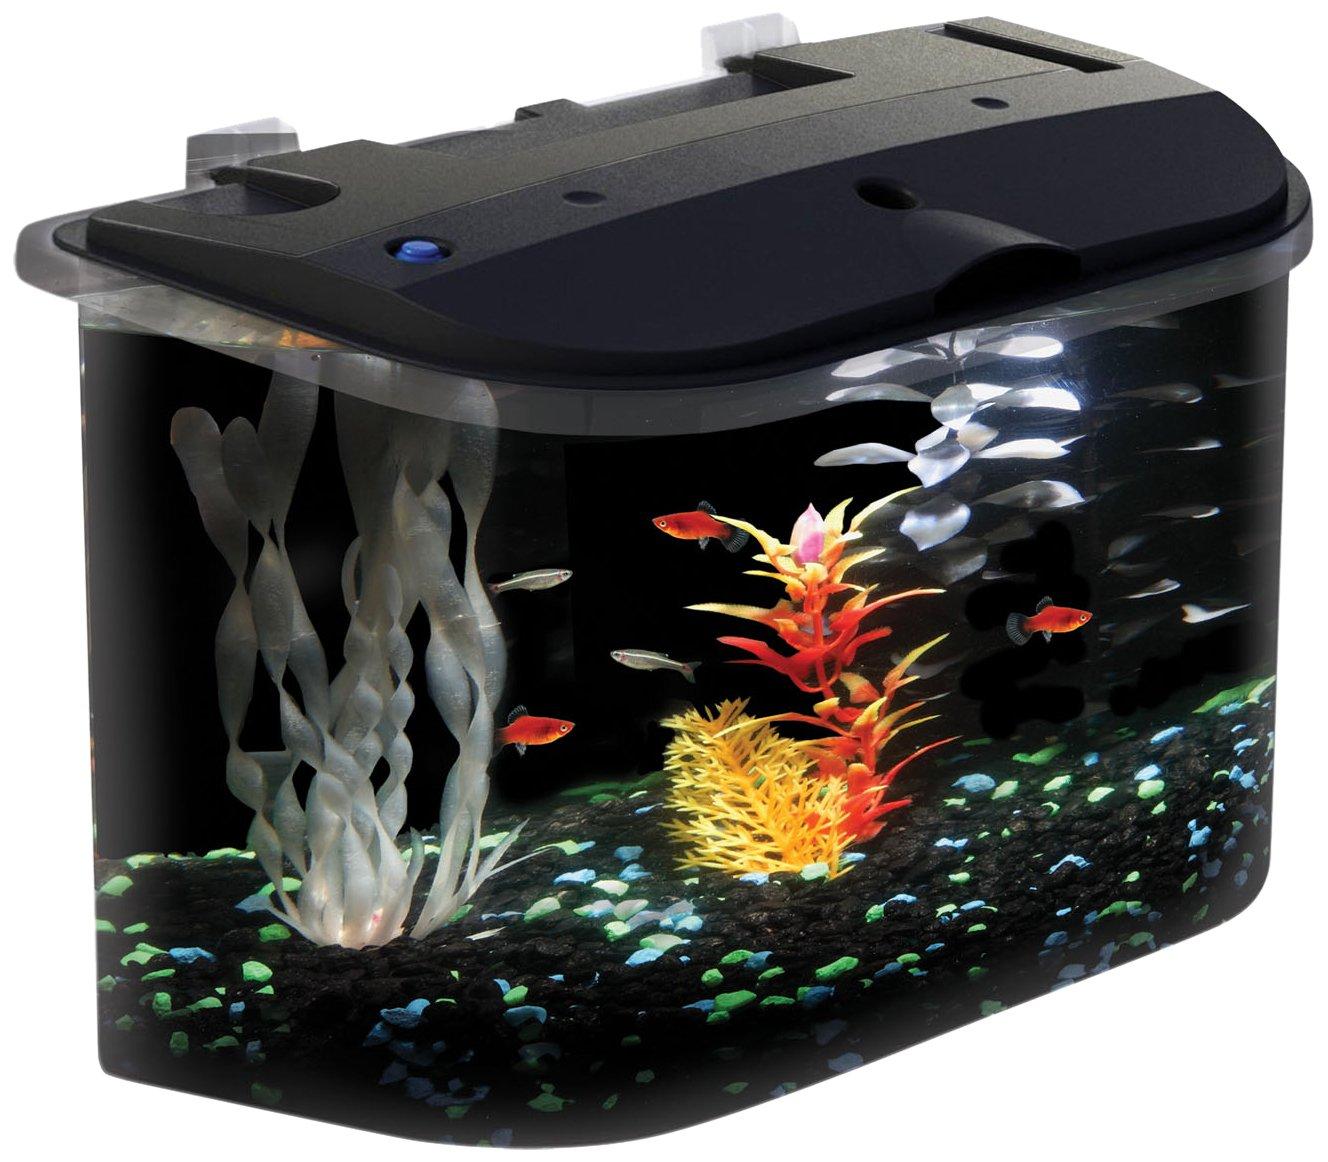 Aquarius aq15005 aquarius 5 rounded 5 gallon aquarium kit for 30 gallon fish tank kit